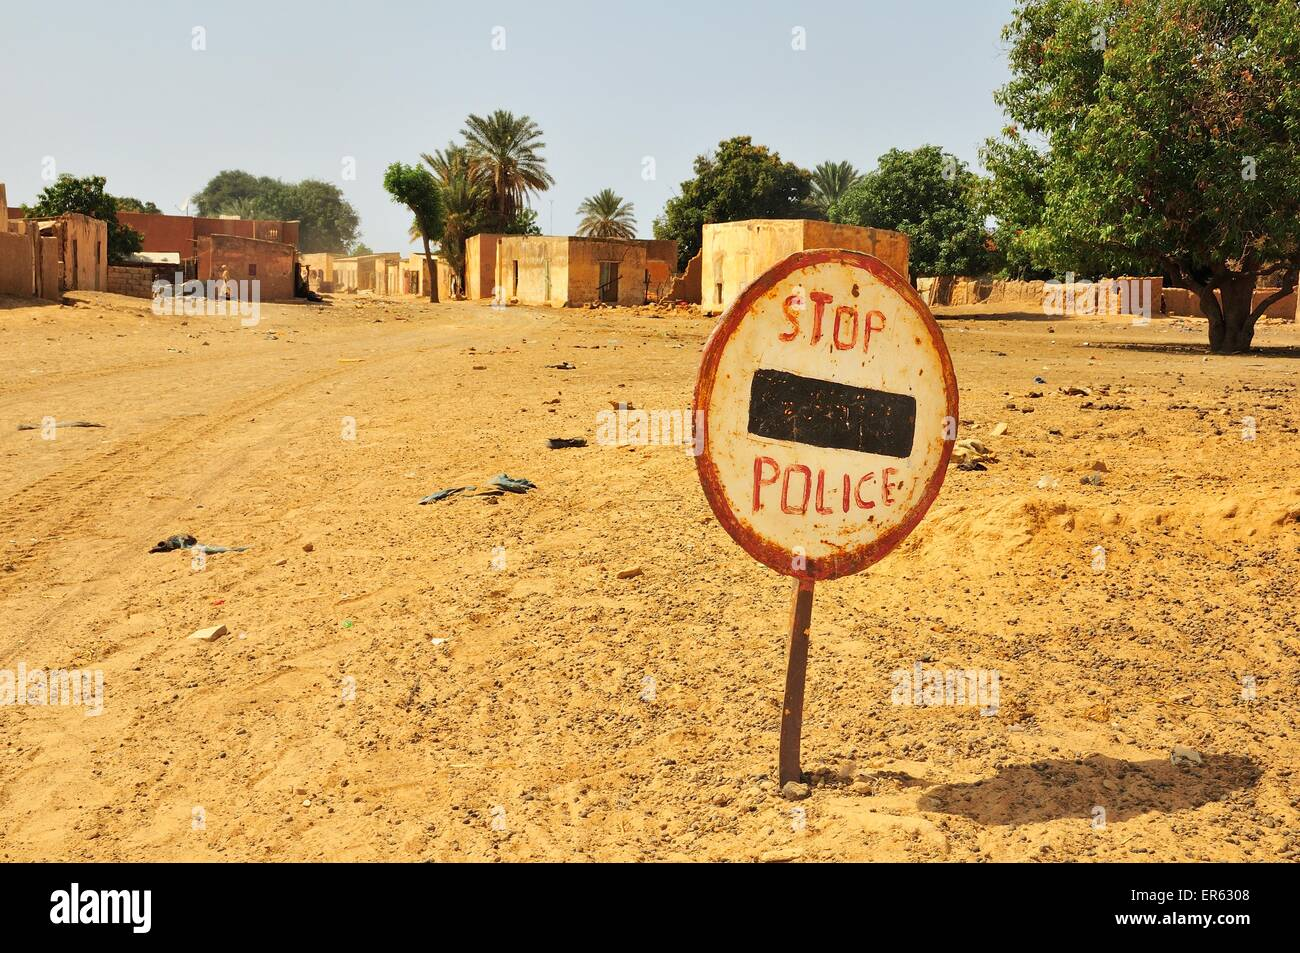 Sign, stop, police, border to Senegal, Lekseiba II, Brakna region, Mauritania - Stock Image